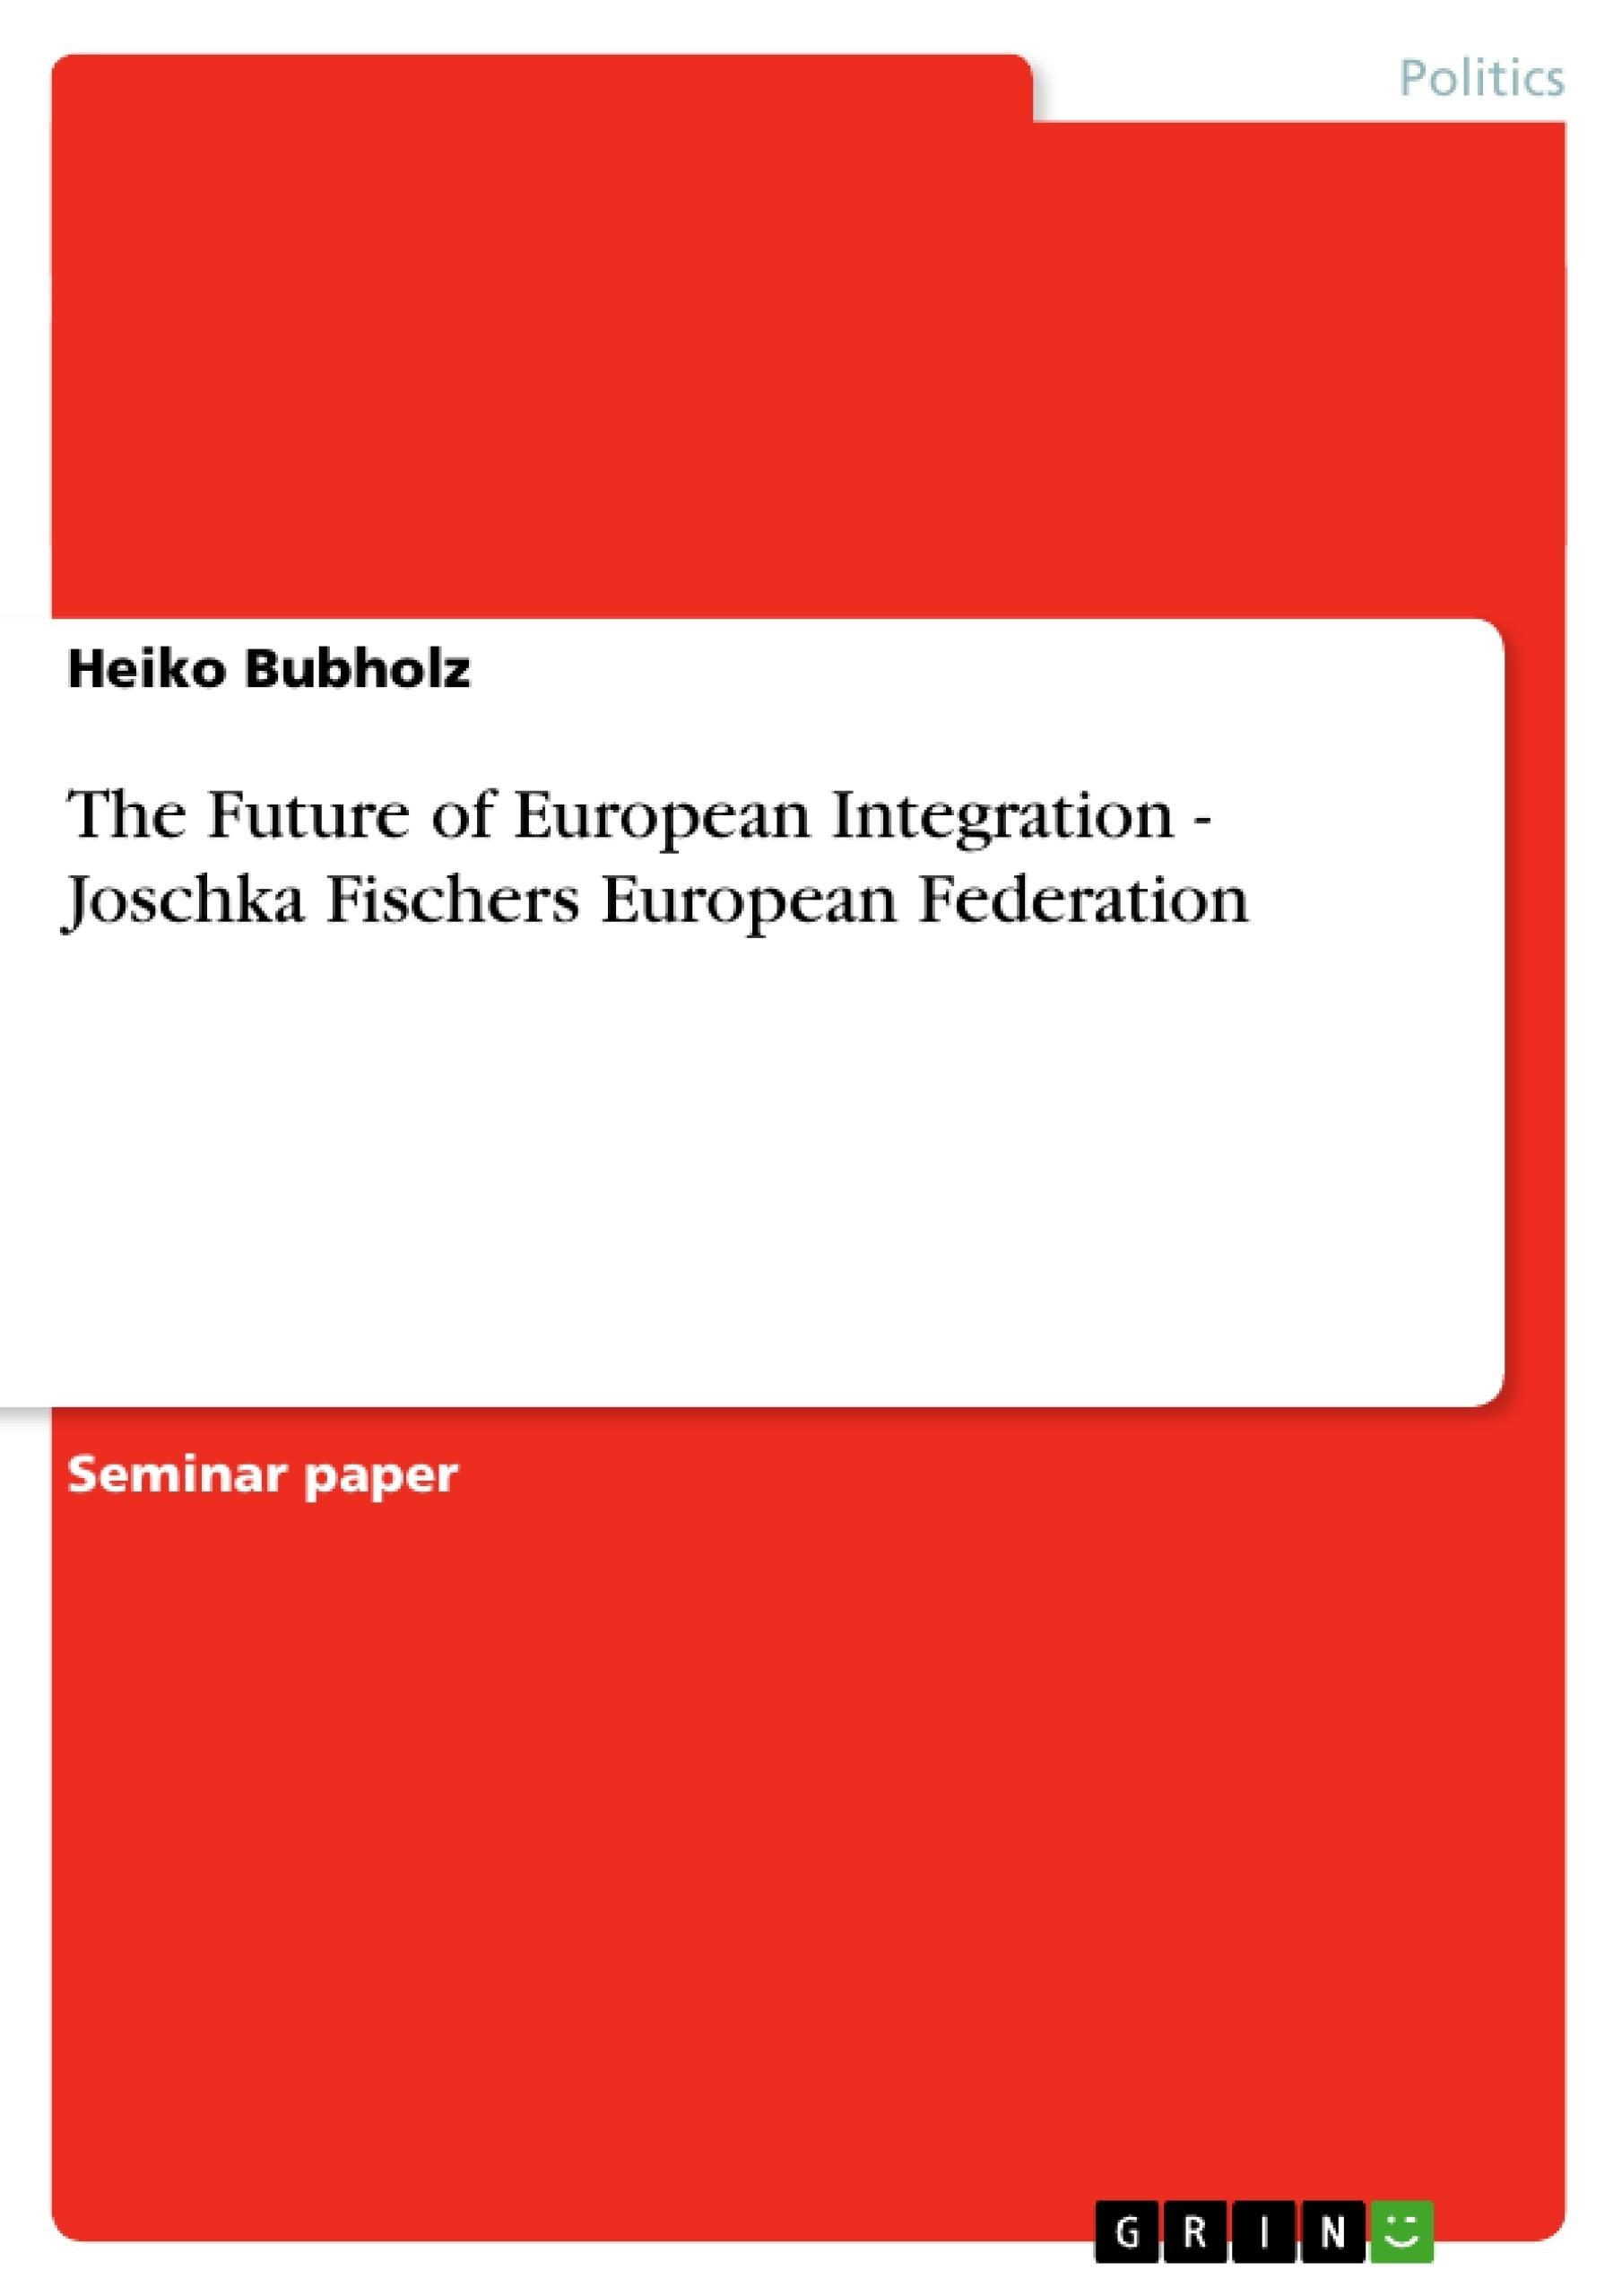 Title: The Future of European Integration - Joschka Fischers European Federation